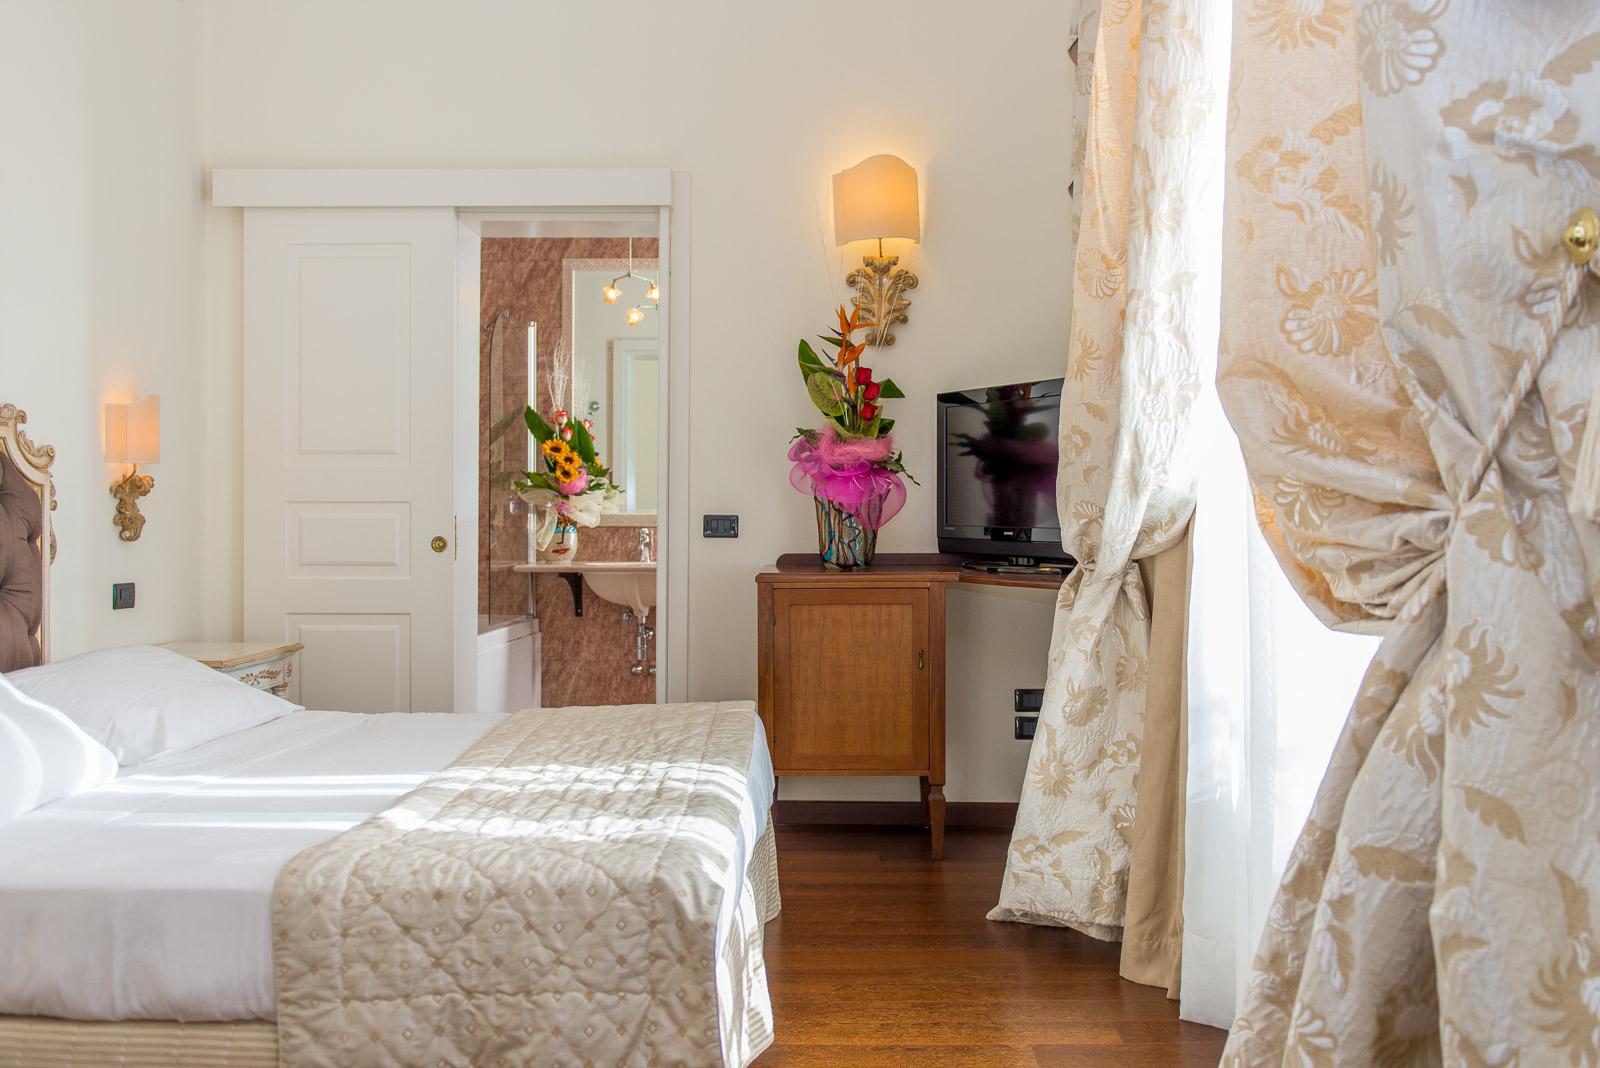 https://www.orlandinifrancesco.com/wp/wp-content/uploads/2018/09/Grand-Hotel-Lecce-3-1.jpg